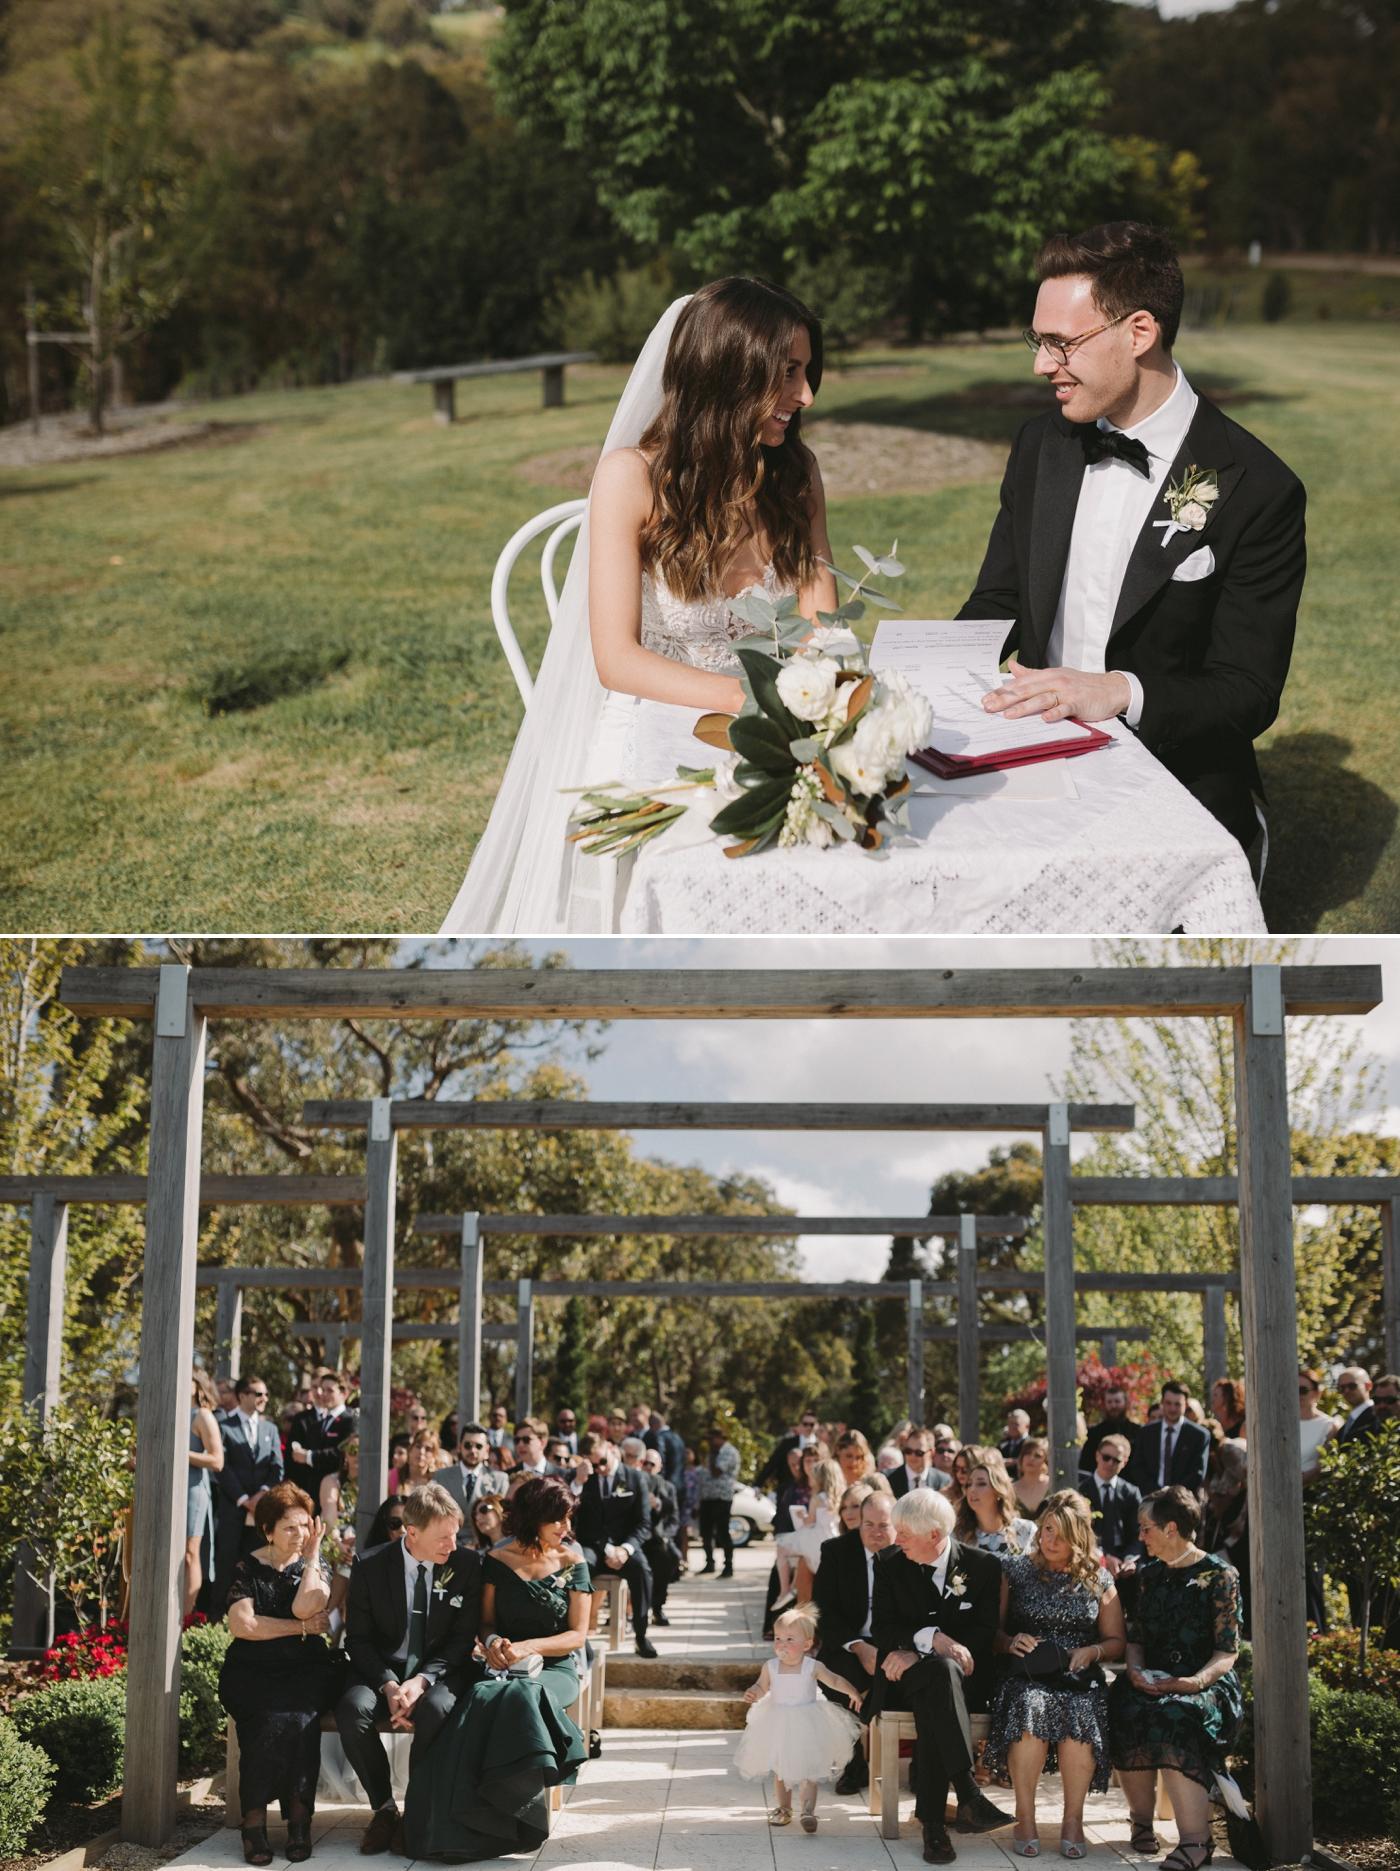 Katie and Ben - Natural Wedding Photography in Adelaide - Beautiful, Candid Wedding Photographer - Adelaide Hills Wedding - Katherine Schultz - www.katherineschultzphotography.com_0040.jpg